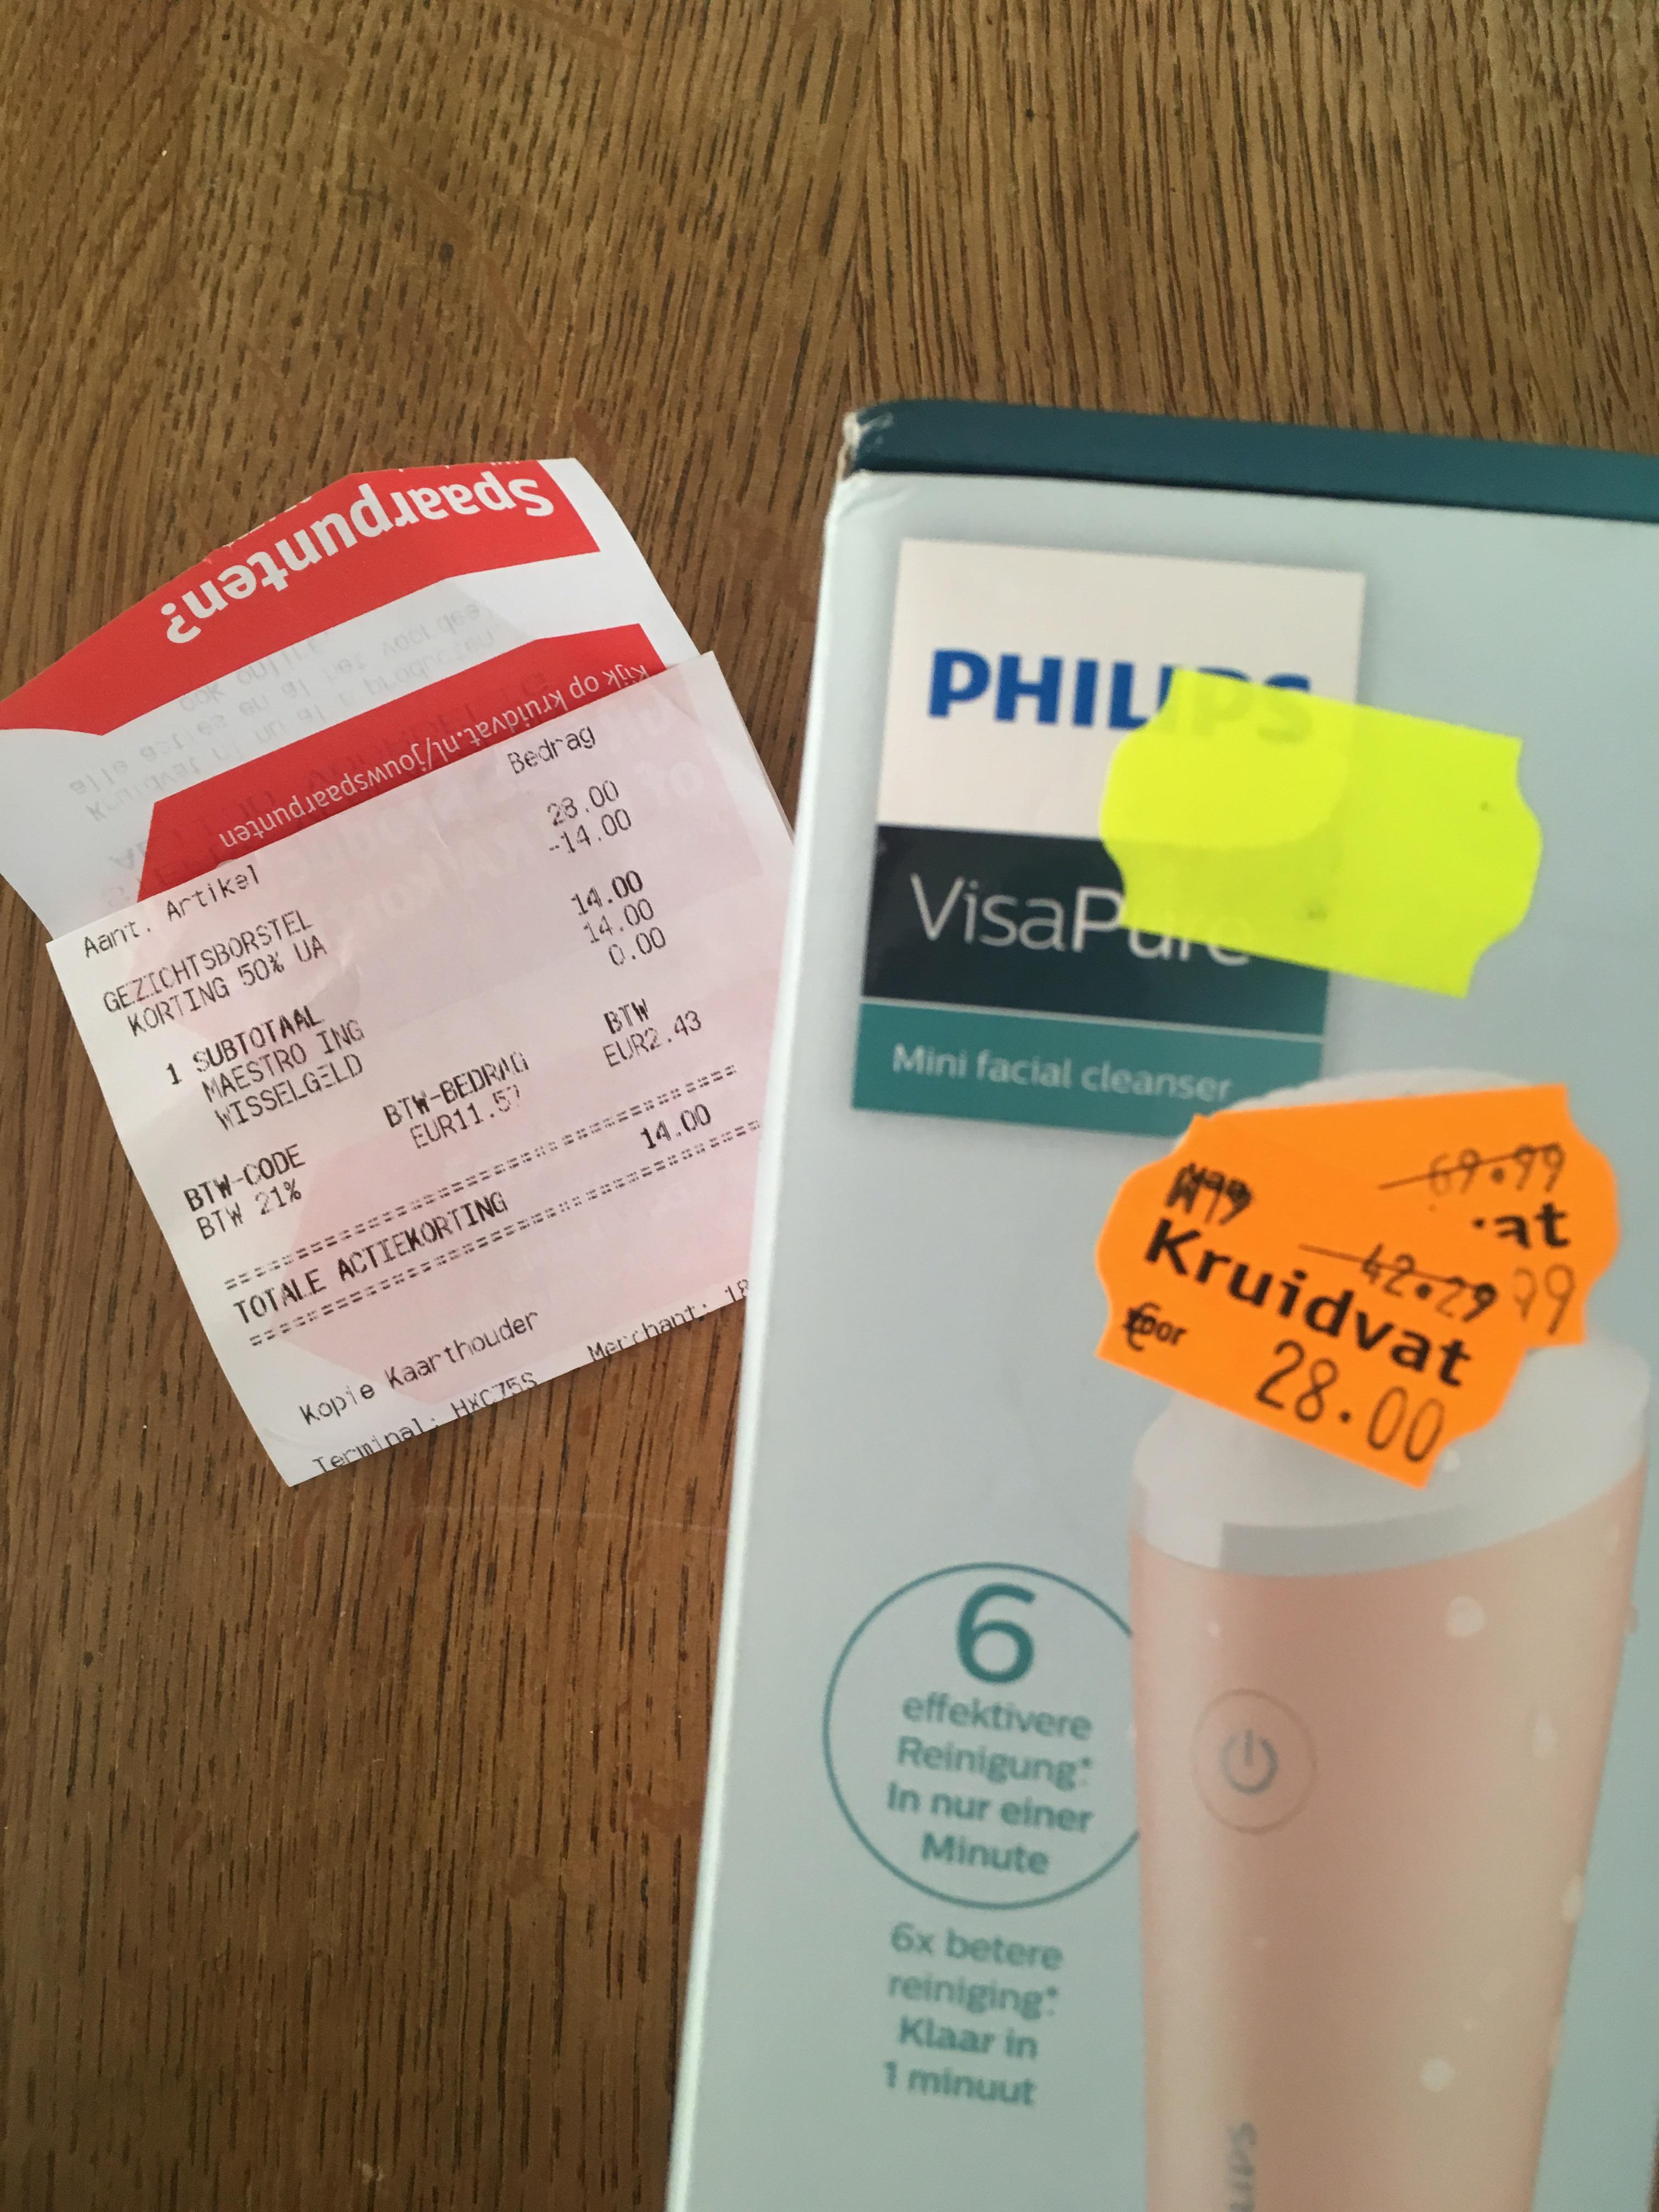 Kruidvat - Philips VisaPure mini facial cleanser